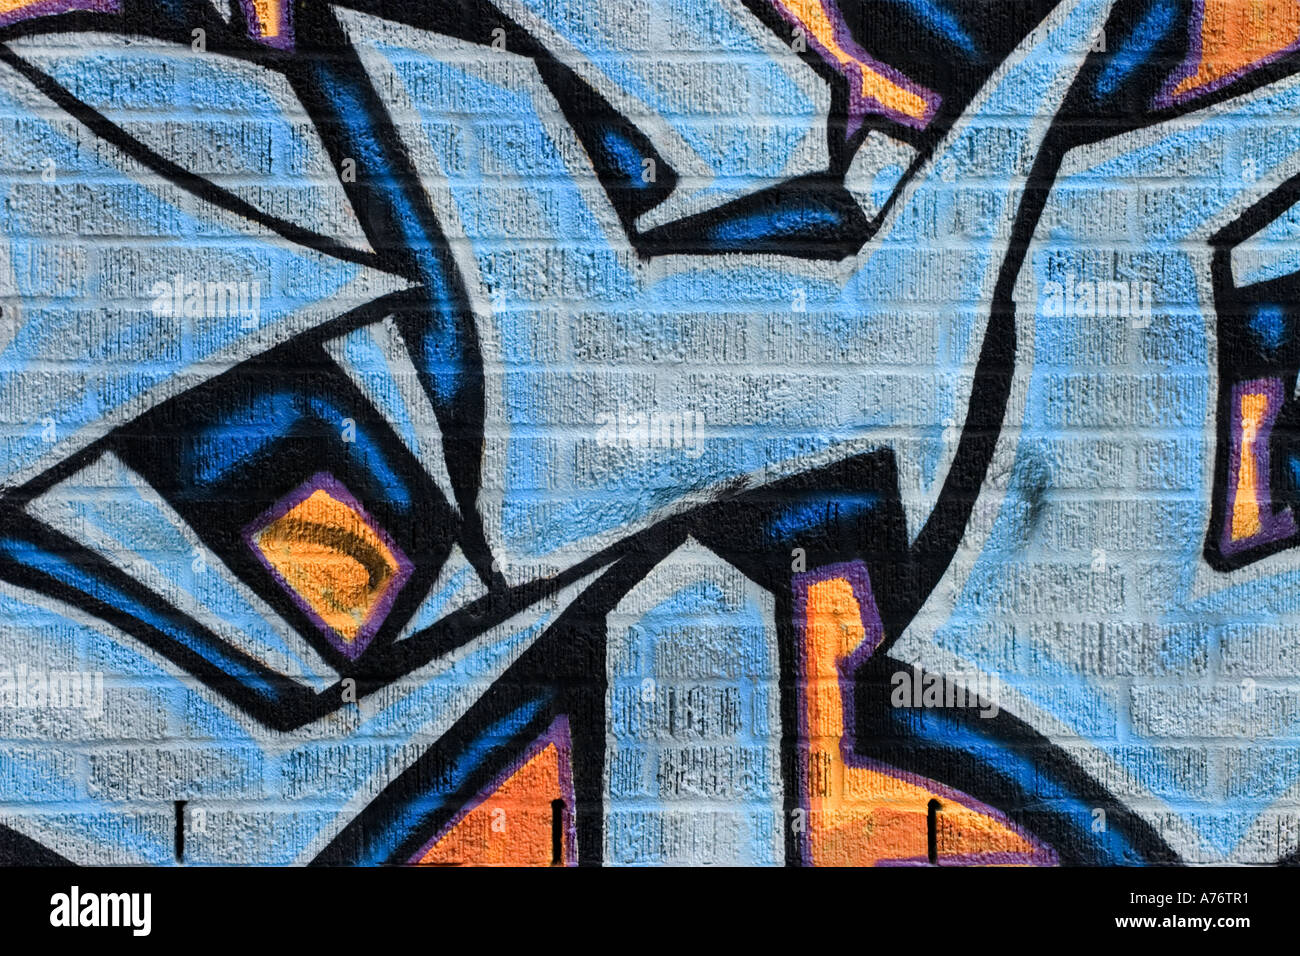 Graffiti wall painting - Stock Photo Wall Painting Brick Blue Black Orange Various Shapes And Lines Street Art Graffiti